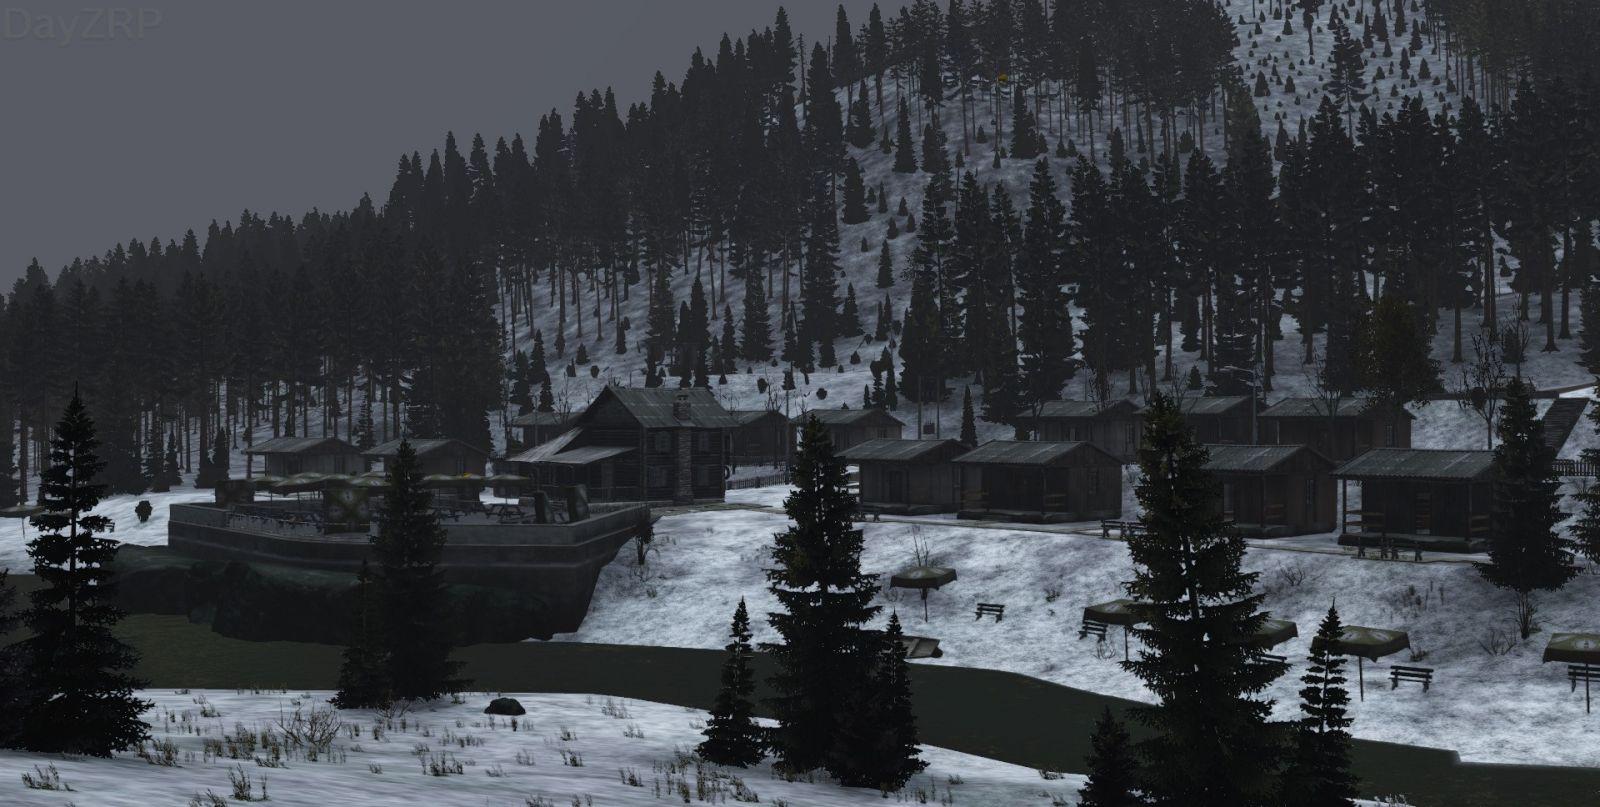 -Winter Camp-